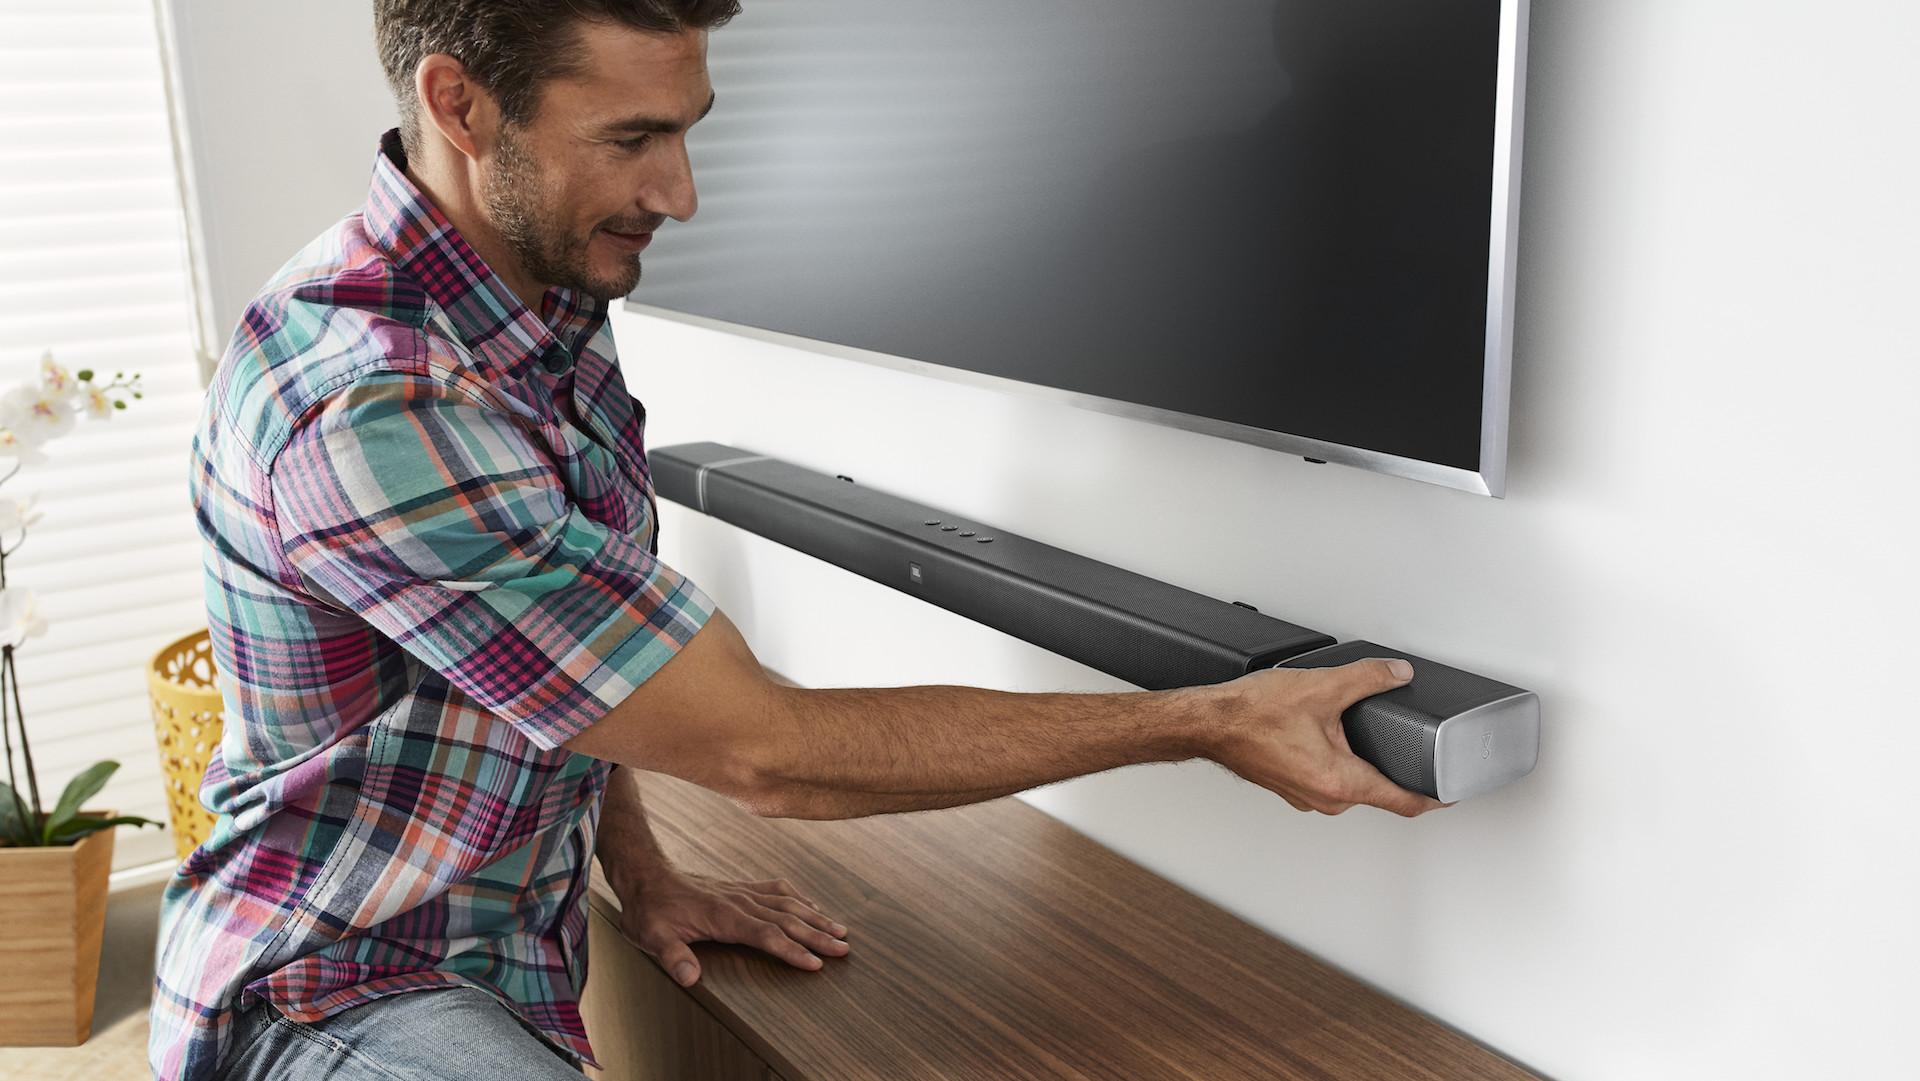 JBL Bar 5.1 soundbar transforms into a wireless surround cinema ...